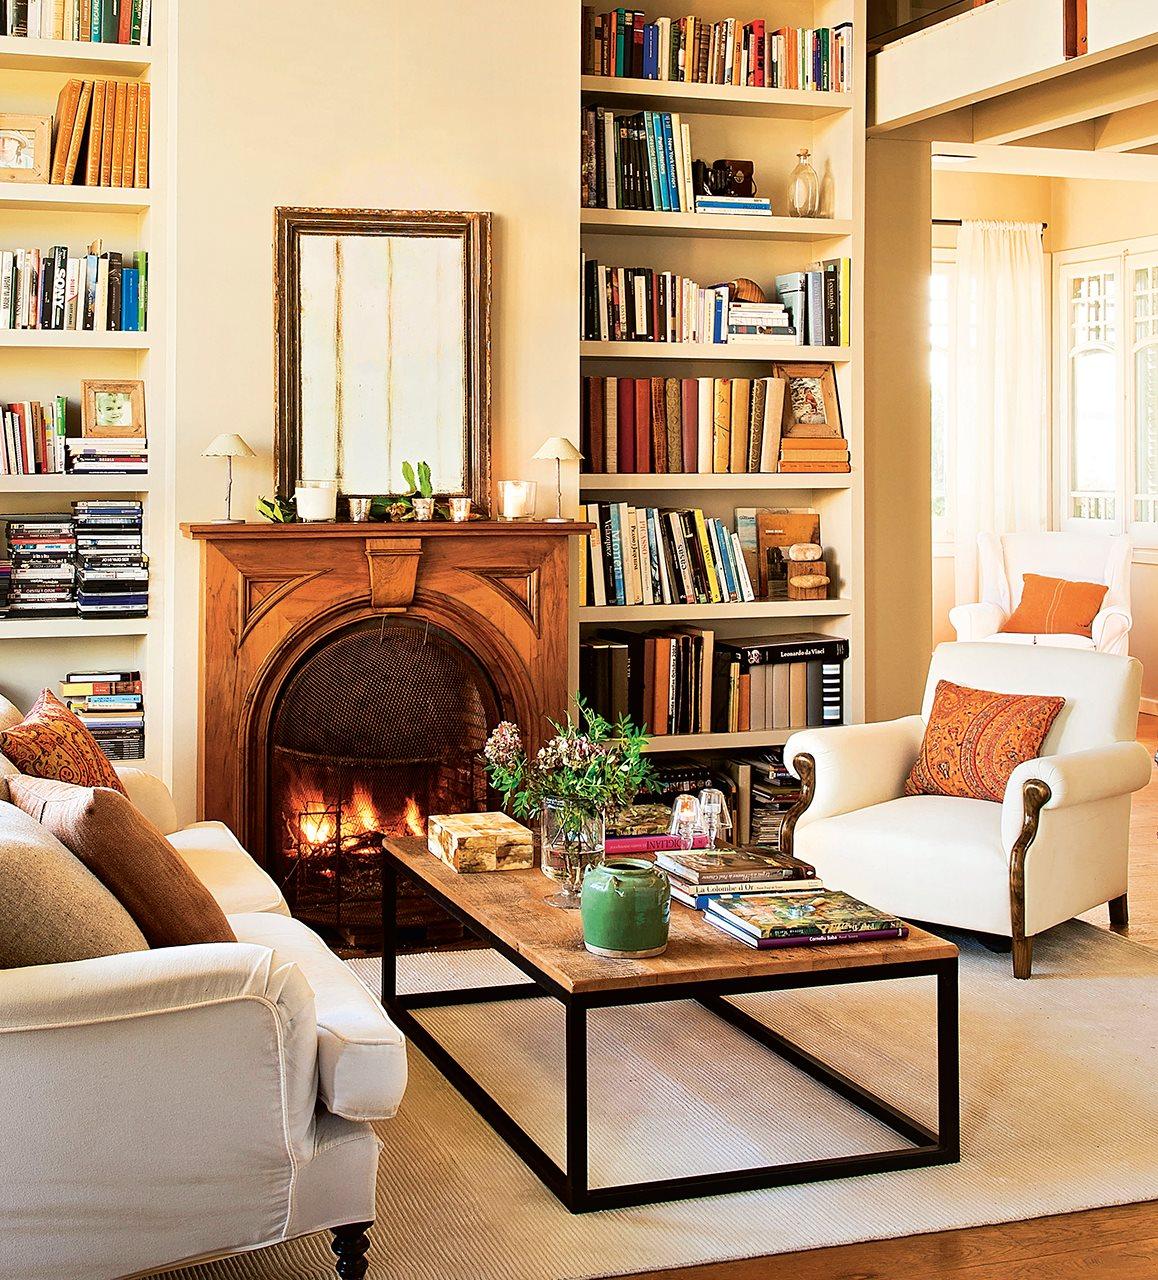 Decoraci n de salones con librer a - Muebles la chimenea catalogo ...